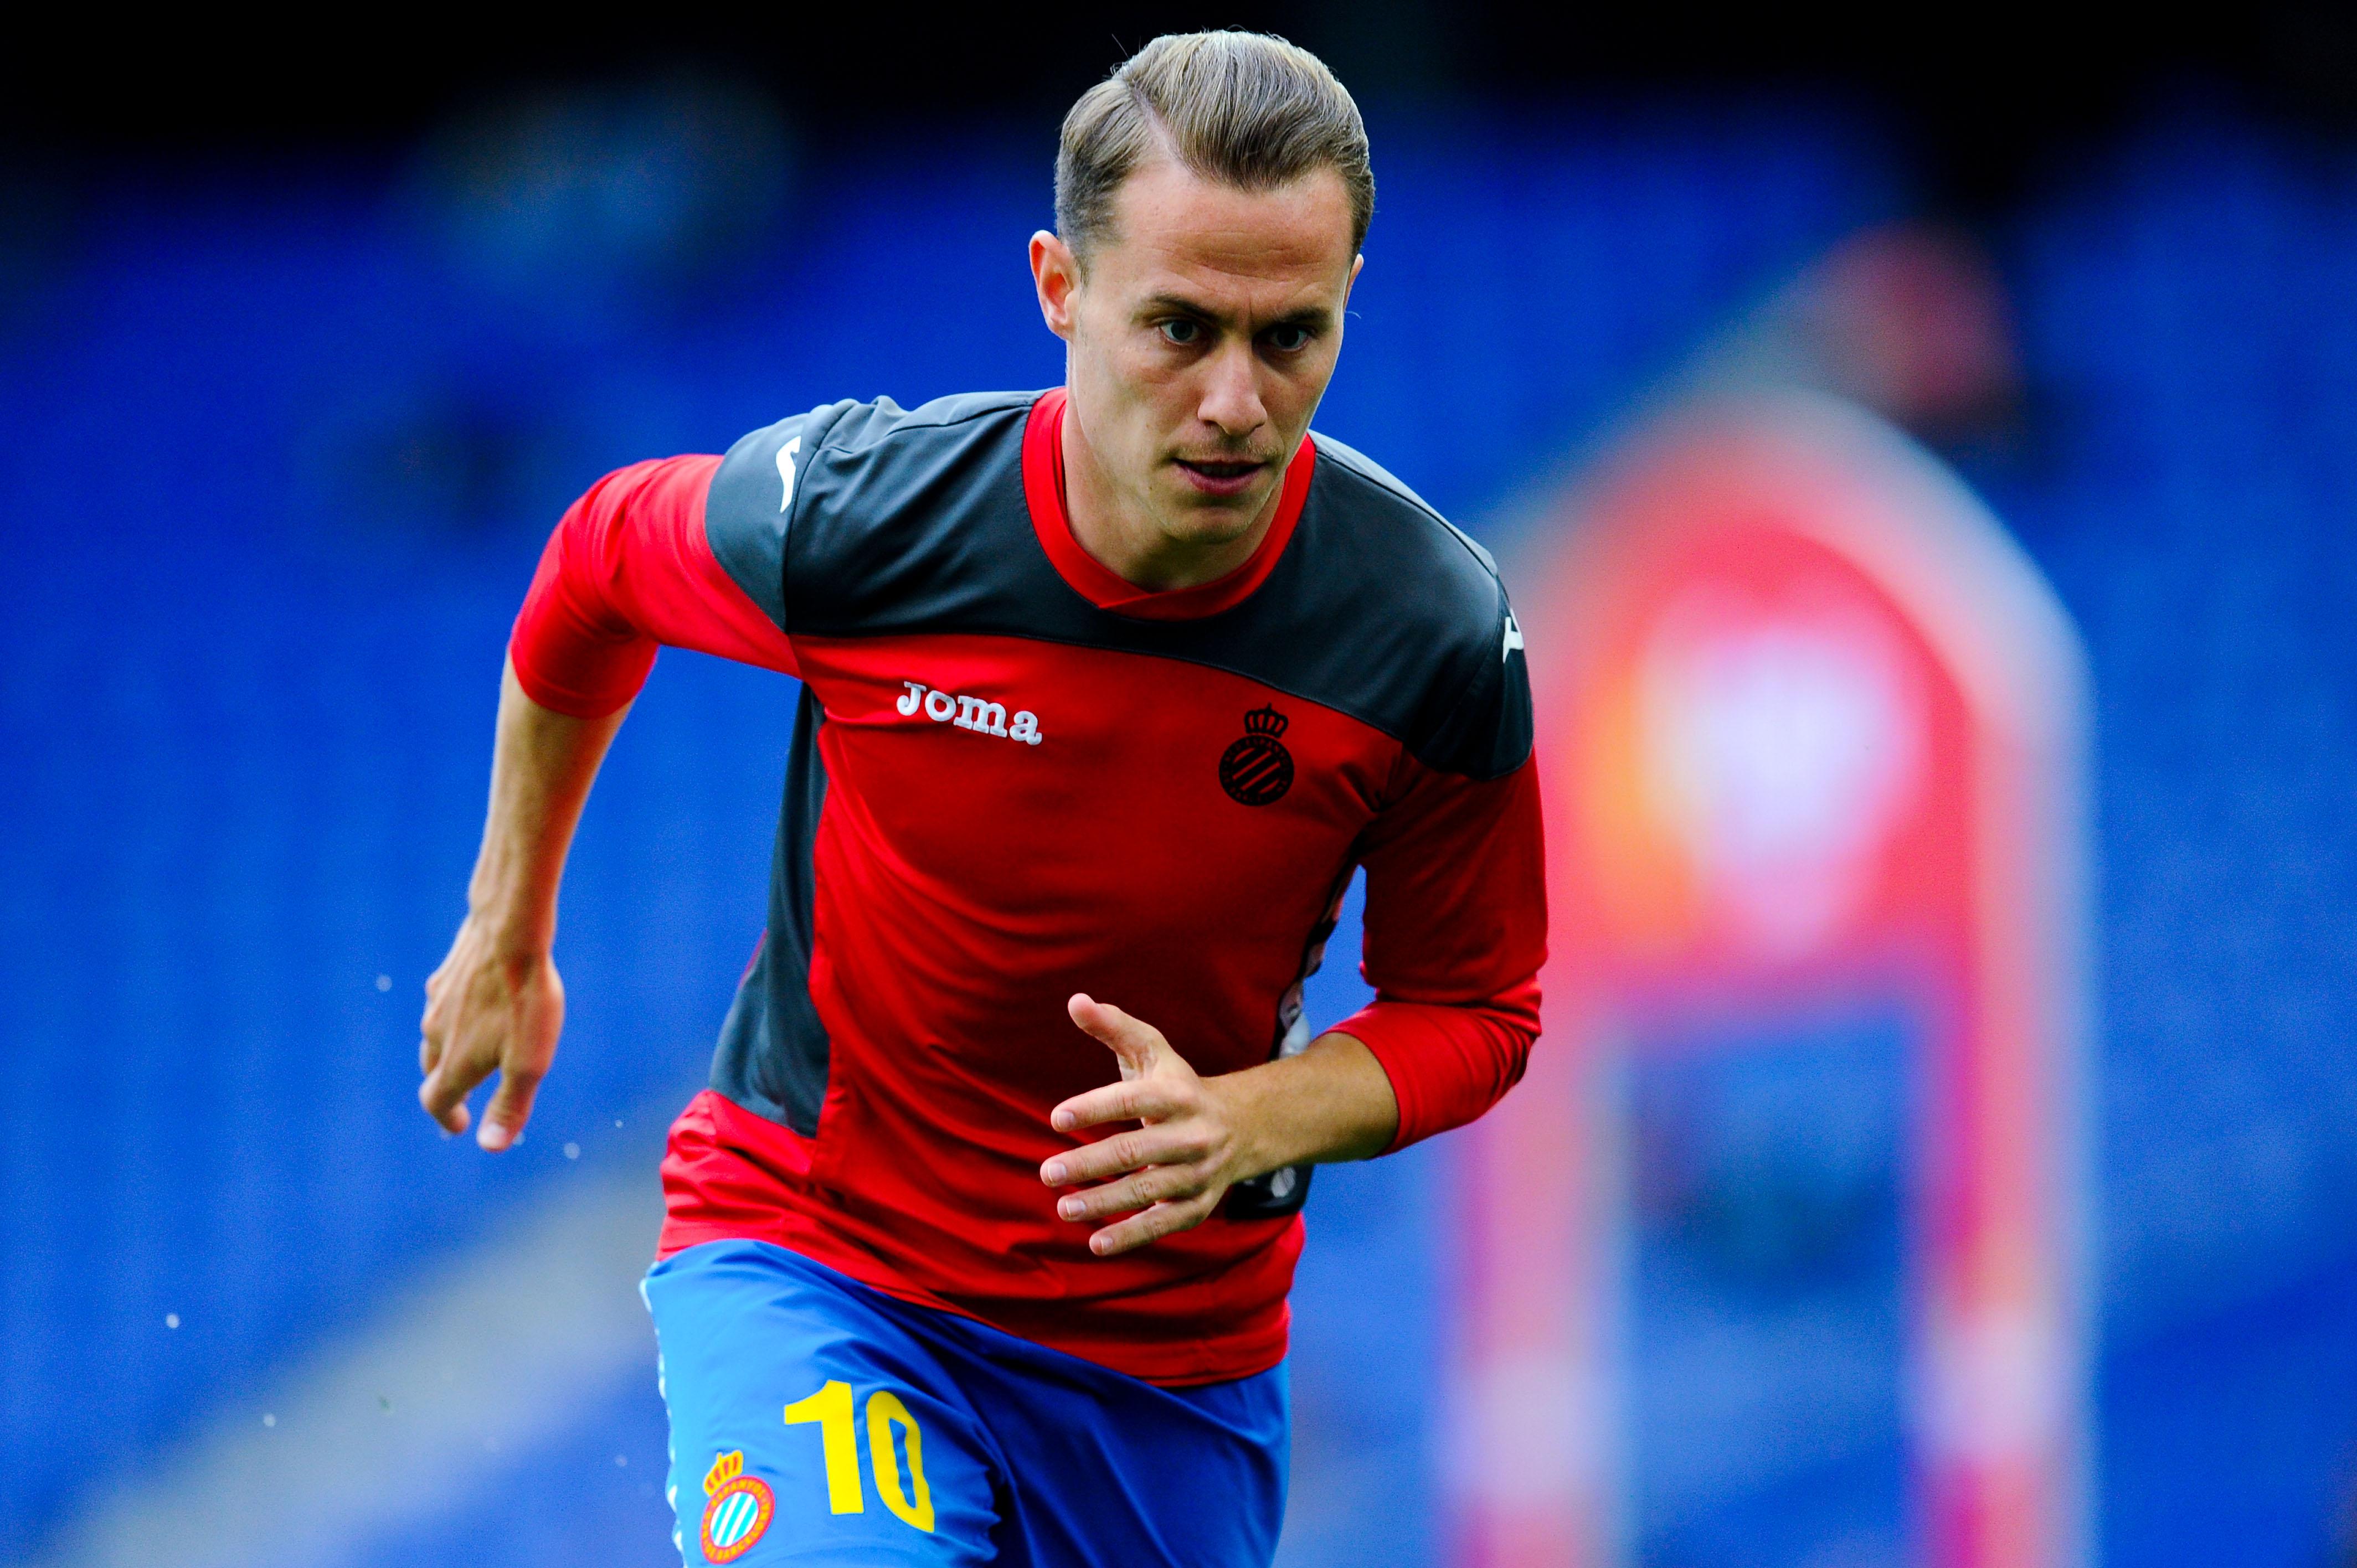 Pumas ficha al mediocampista español Abraham González